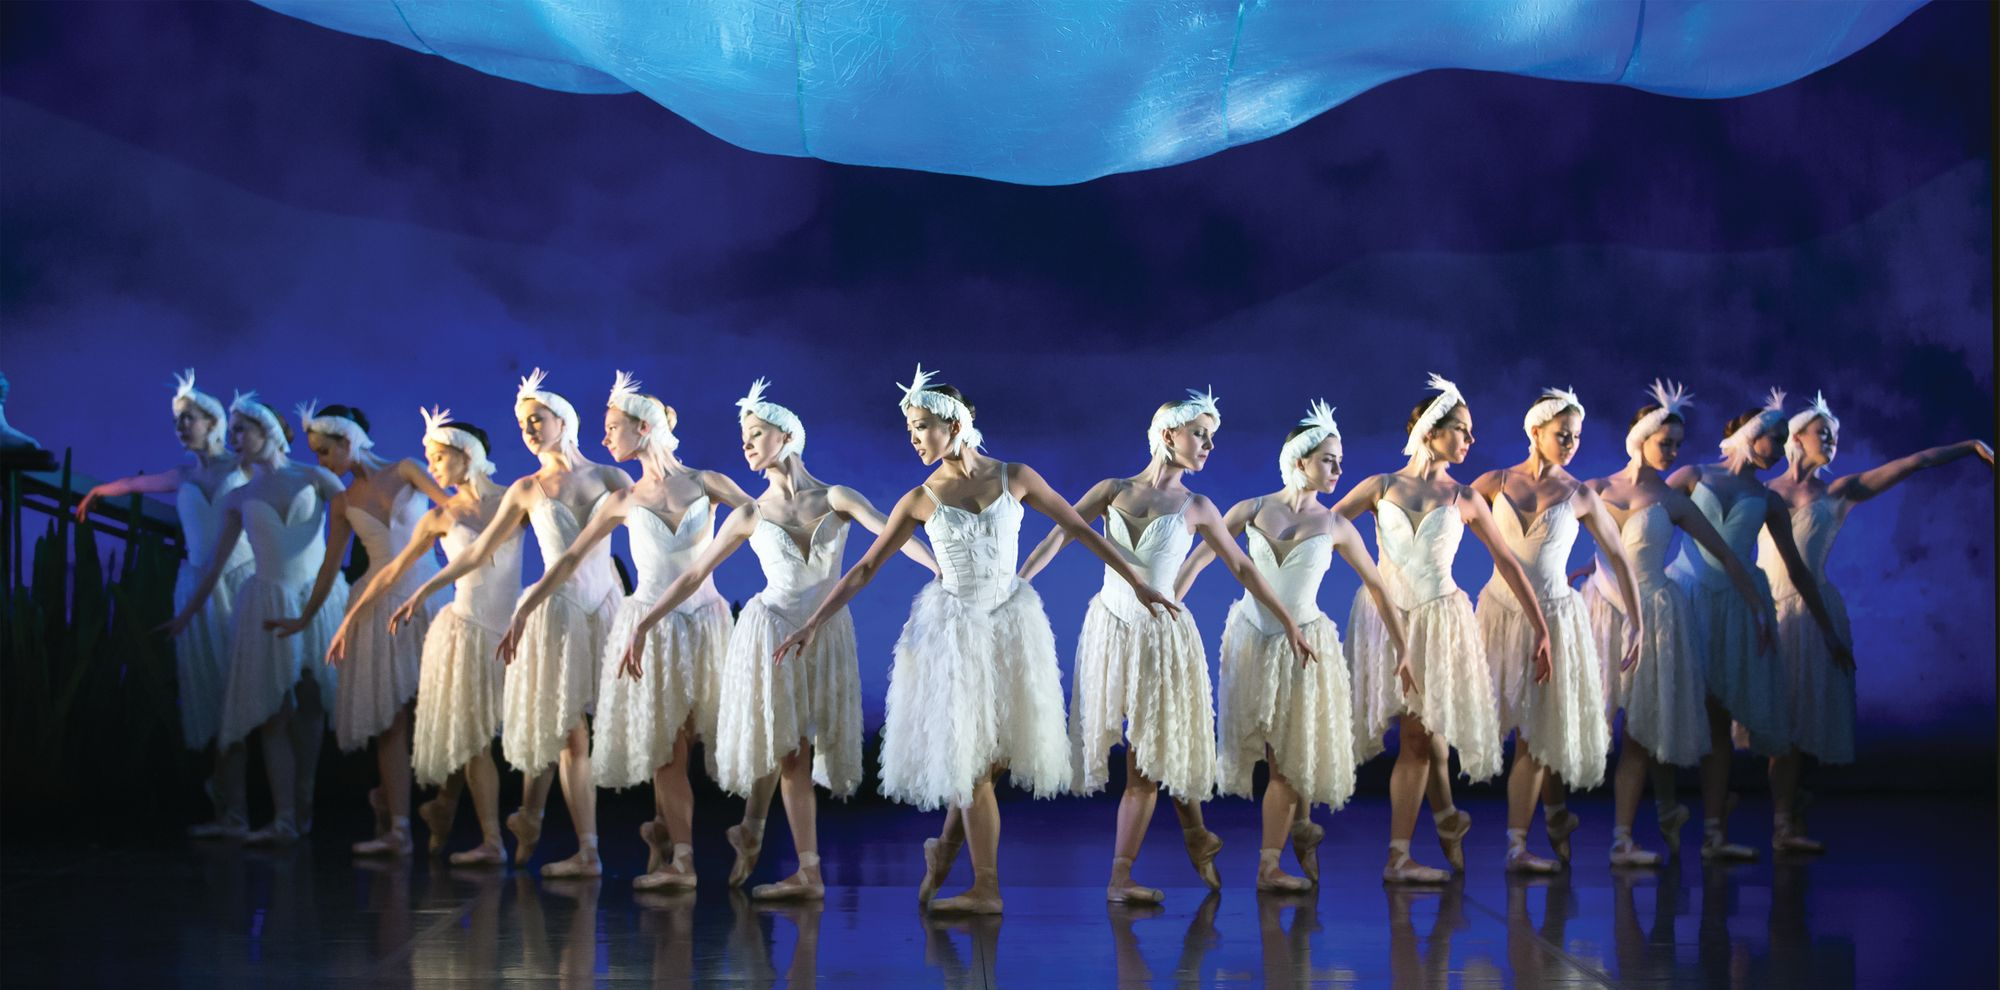 Northern-Ballet-dancers-in-Swan-Lake.-Photo-Emma-Kauldhar-LARGE--2---1-